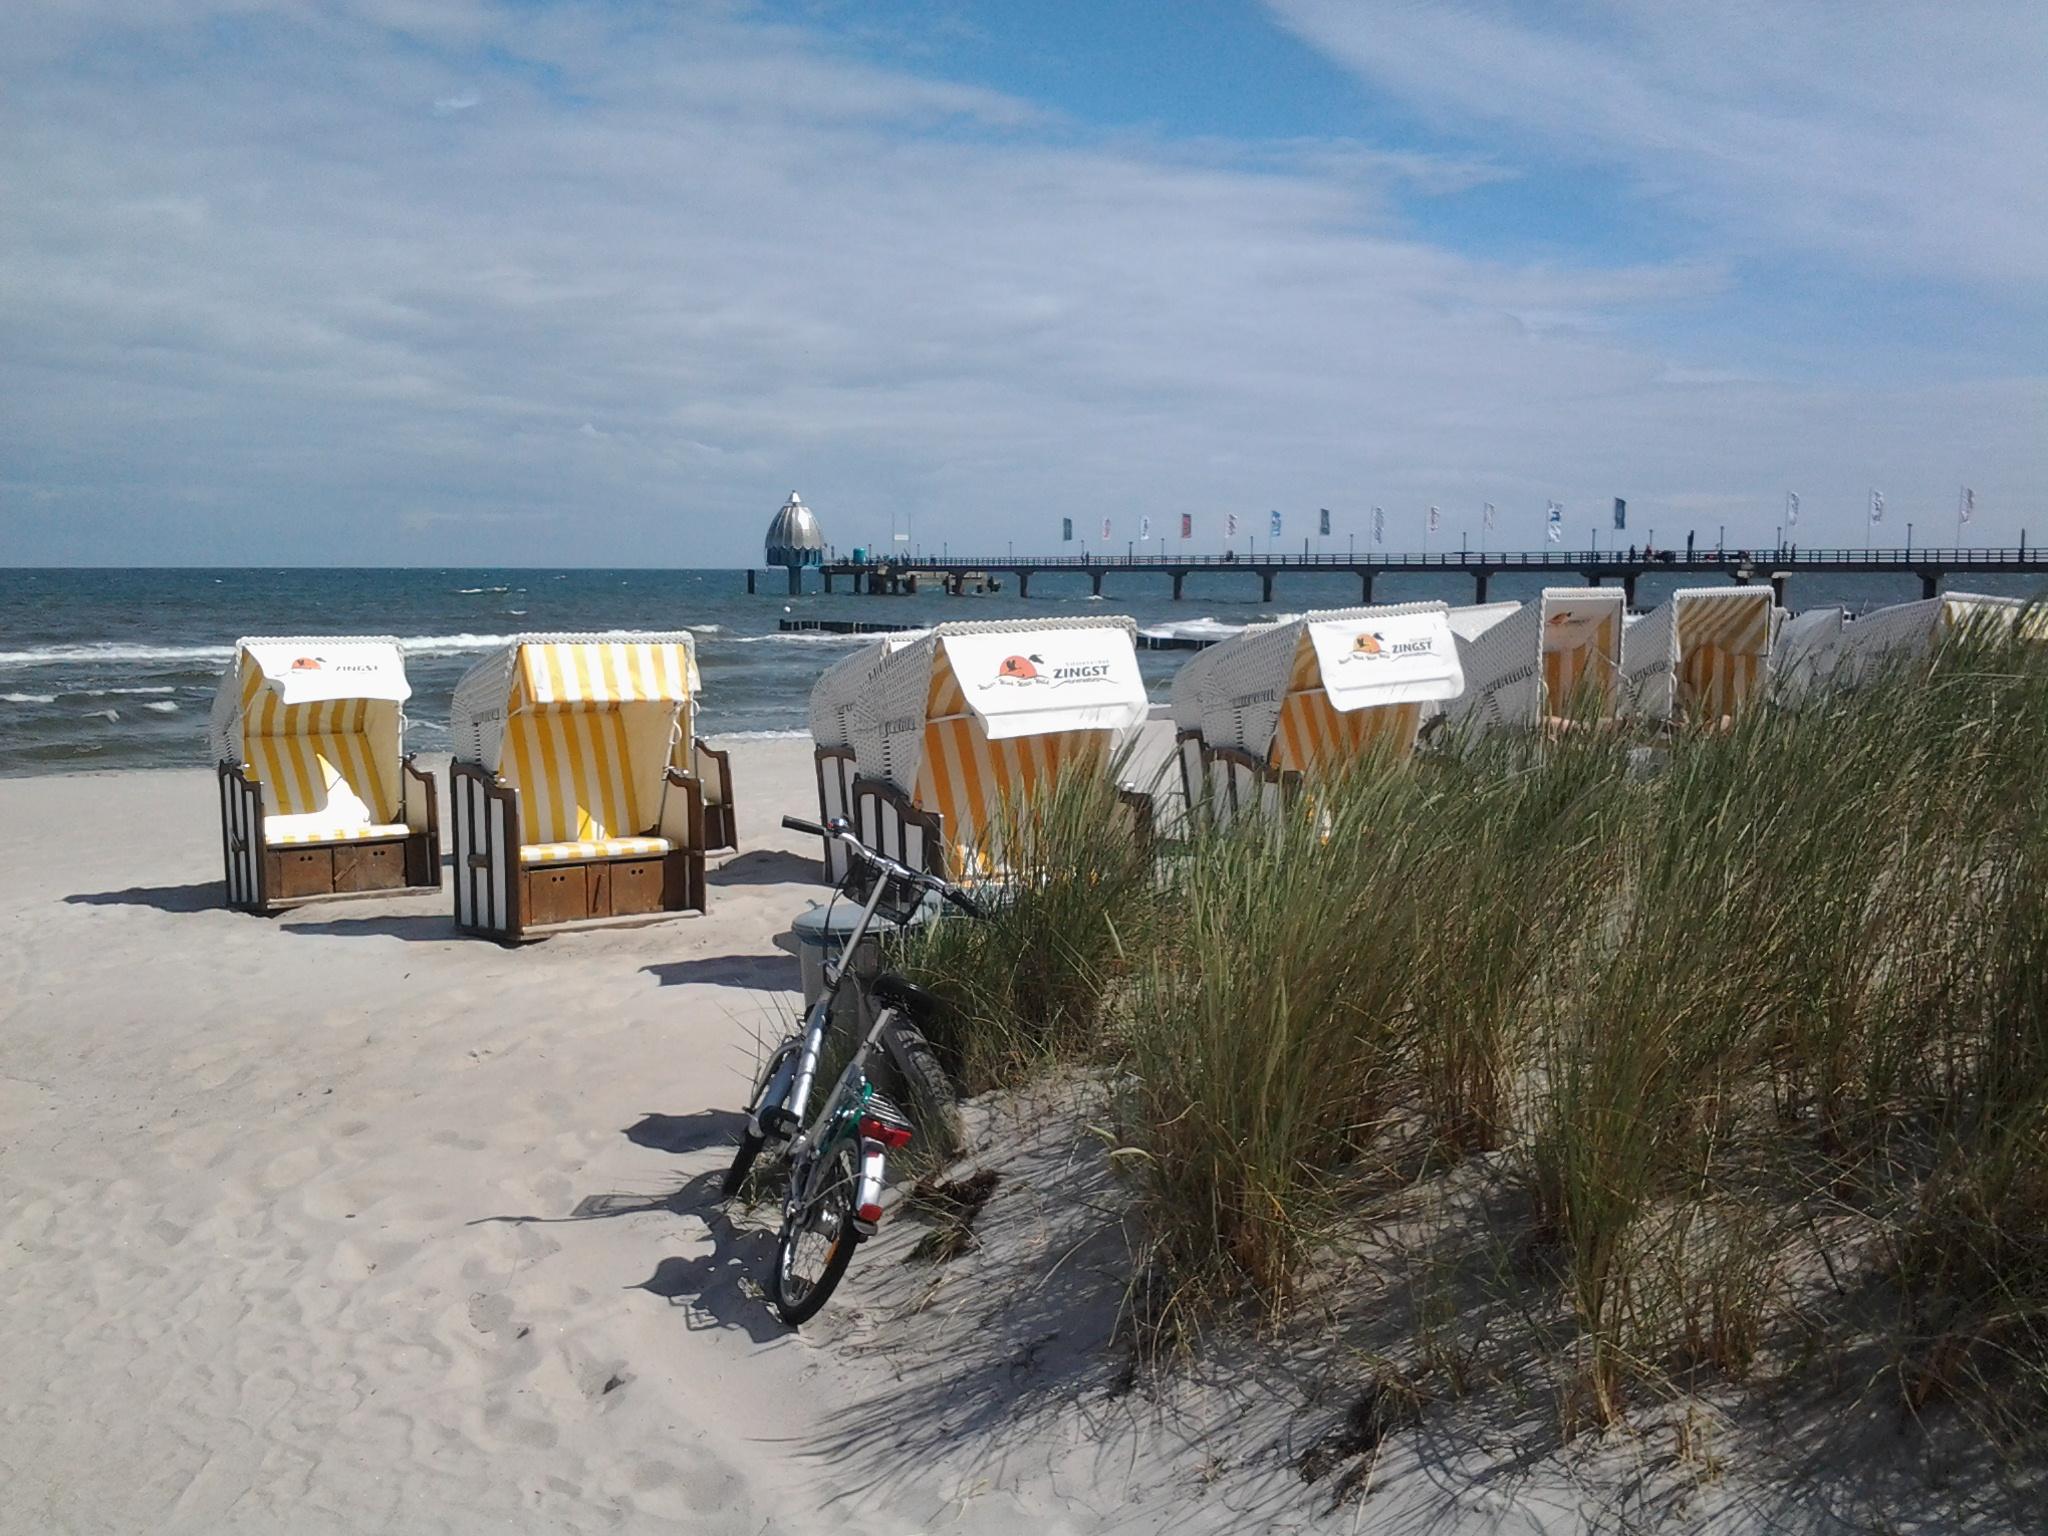 Ferienresidenz Zingst Am Strand Ferienwohnung In Zingst